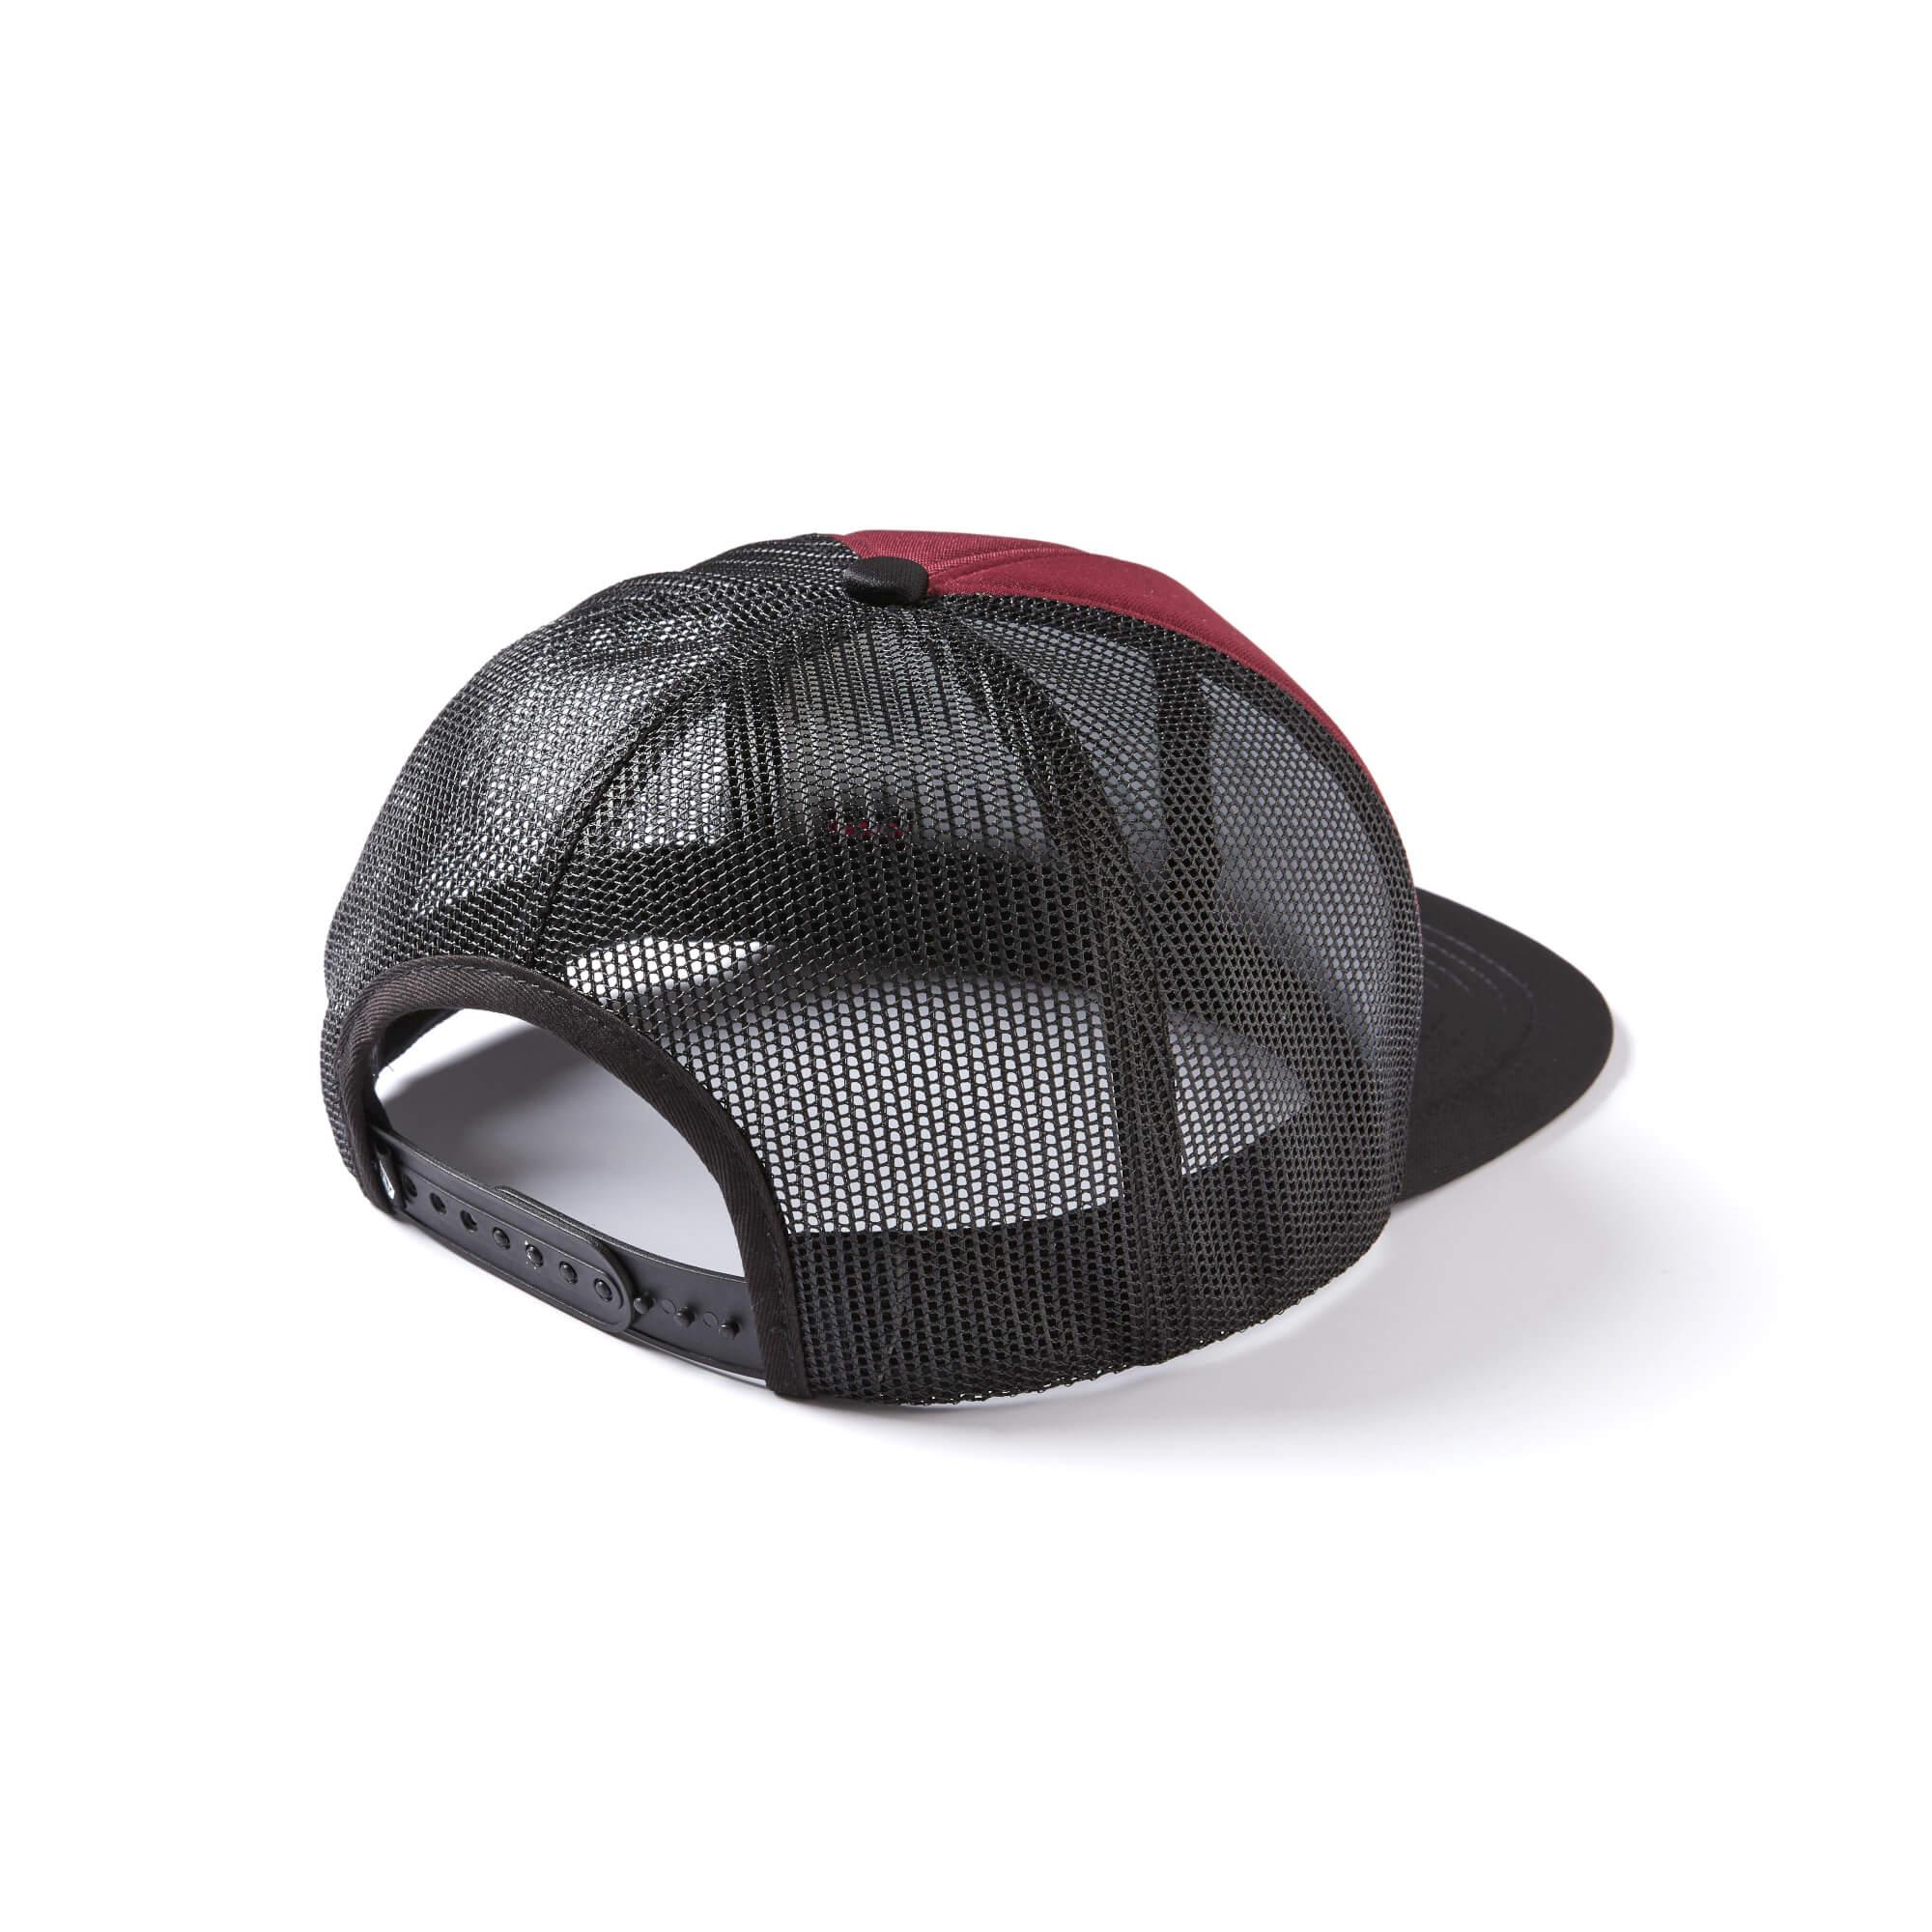 Volcom-V-Quarter-Cheese-Trucker-Hat Indexbild 10